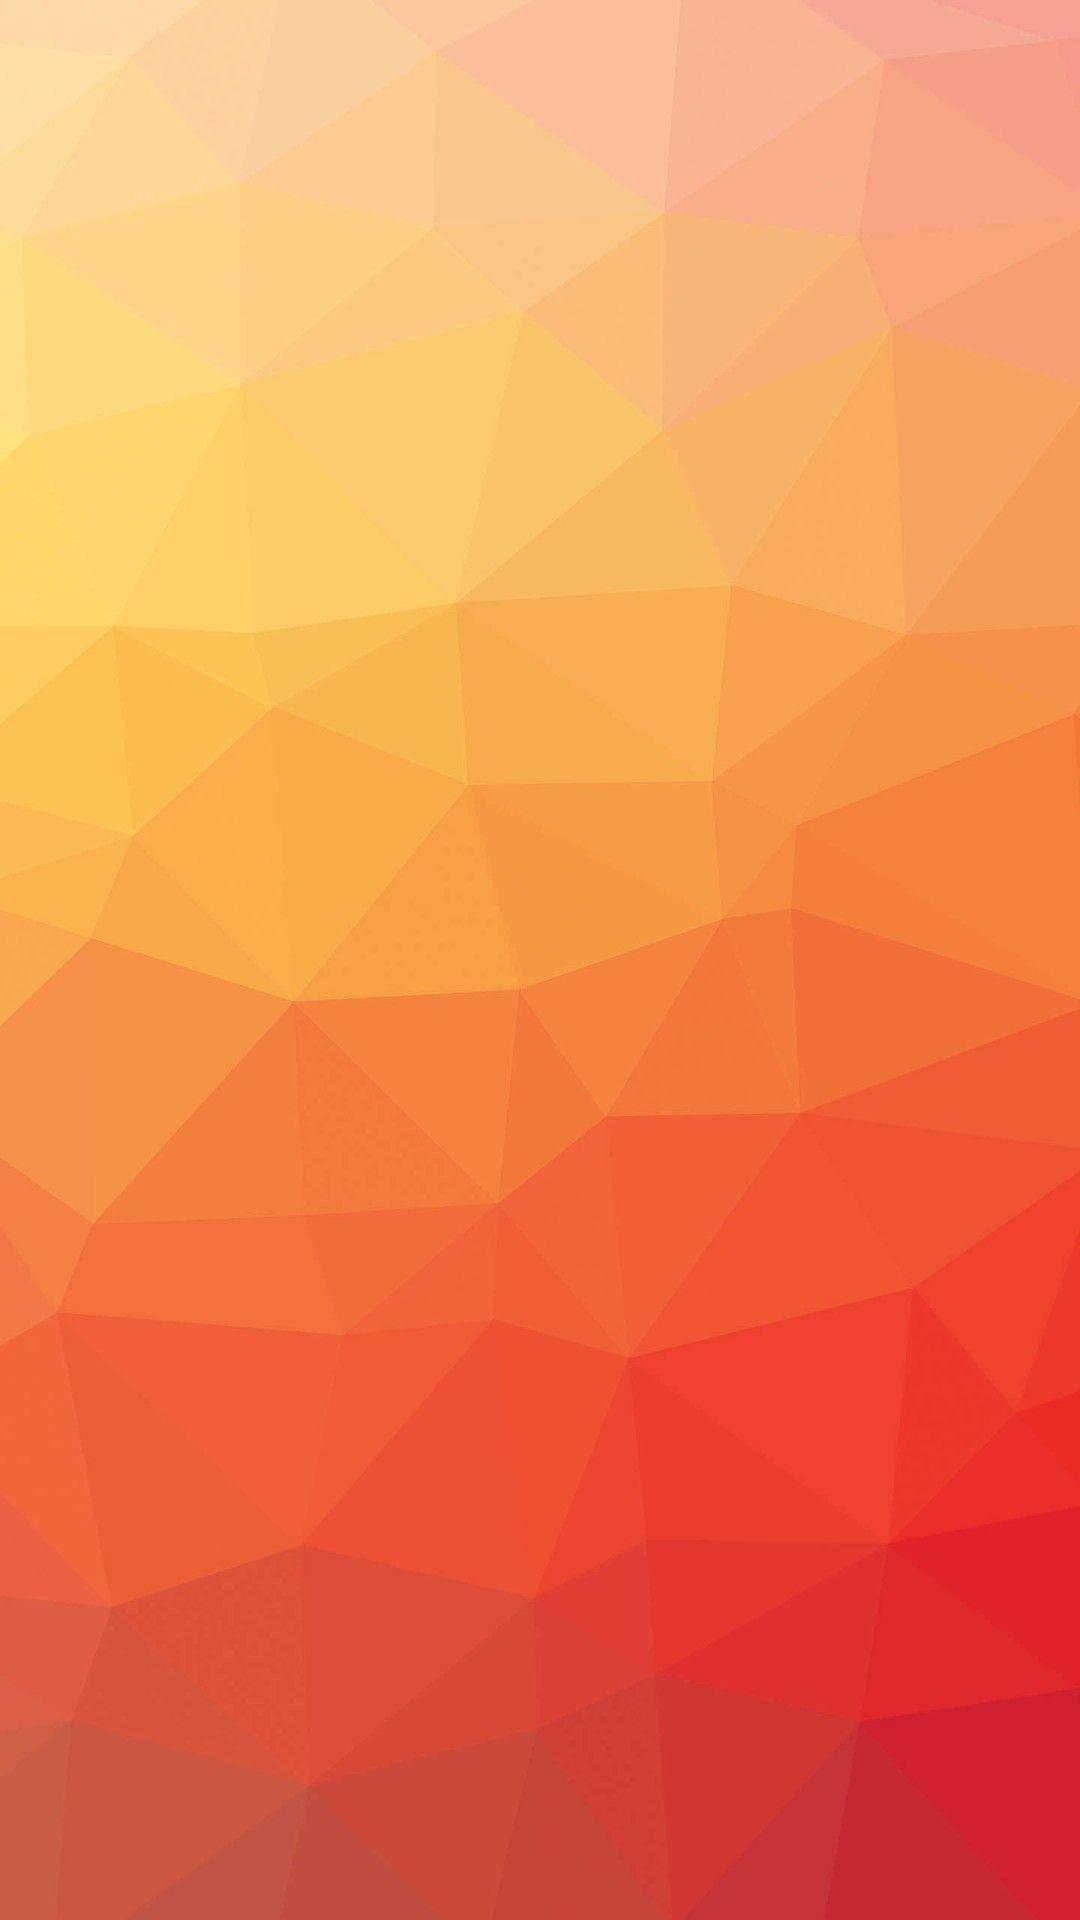 Simple Background Orange Pattern wallpaper 5